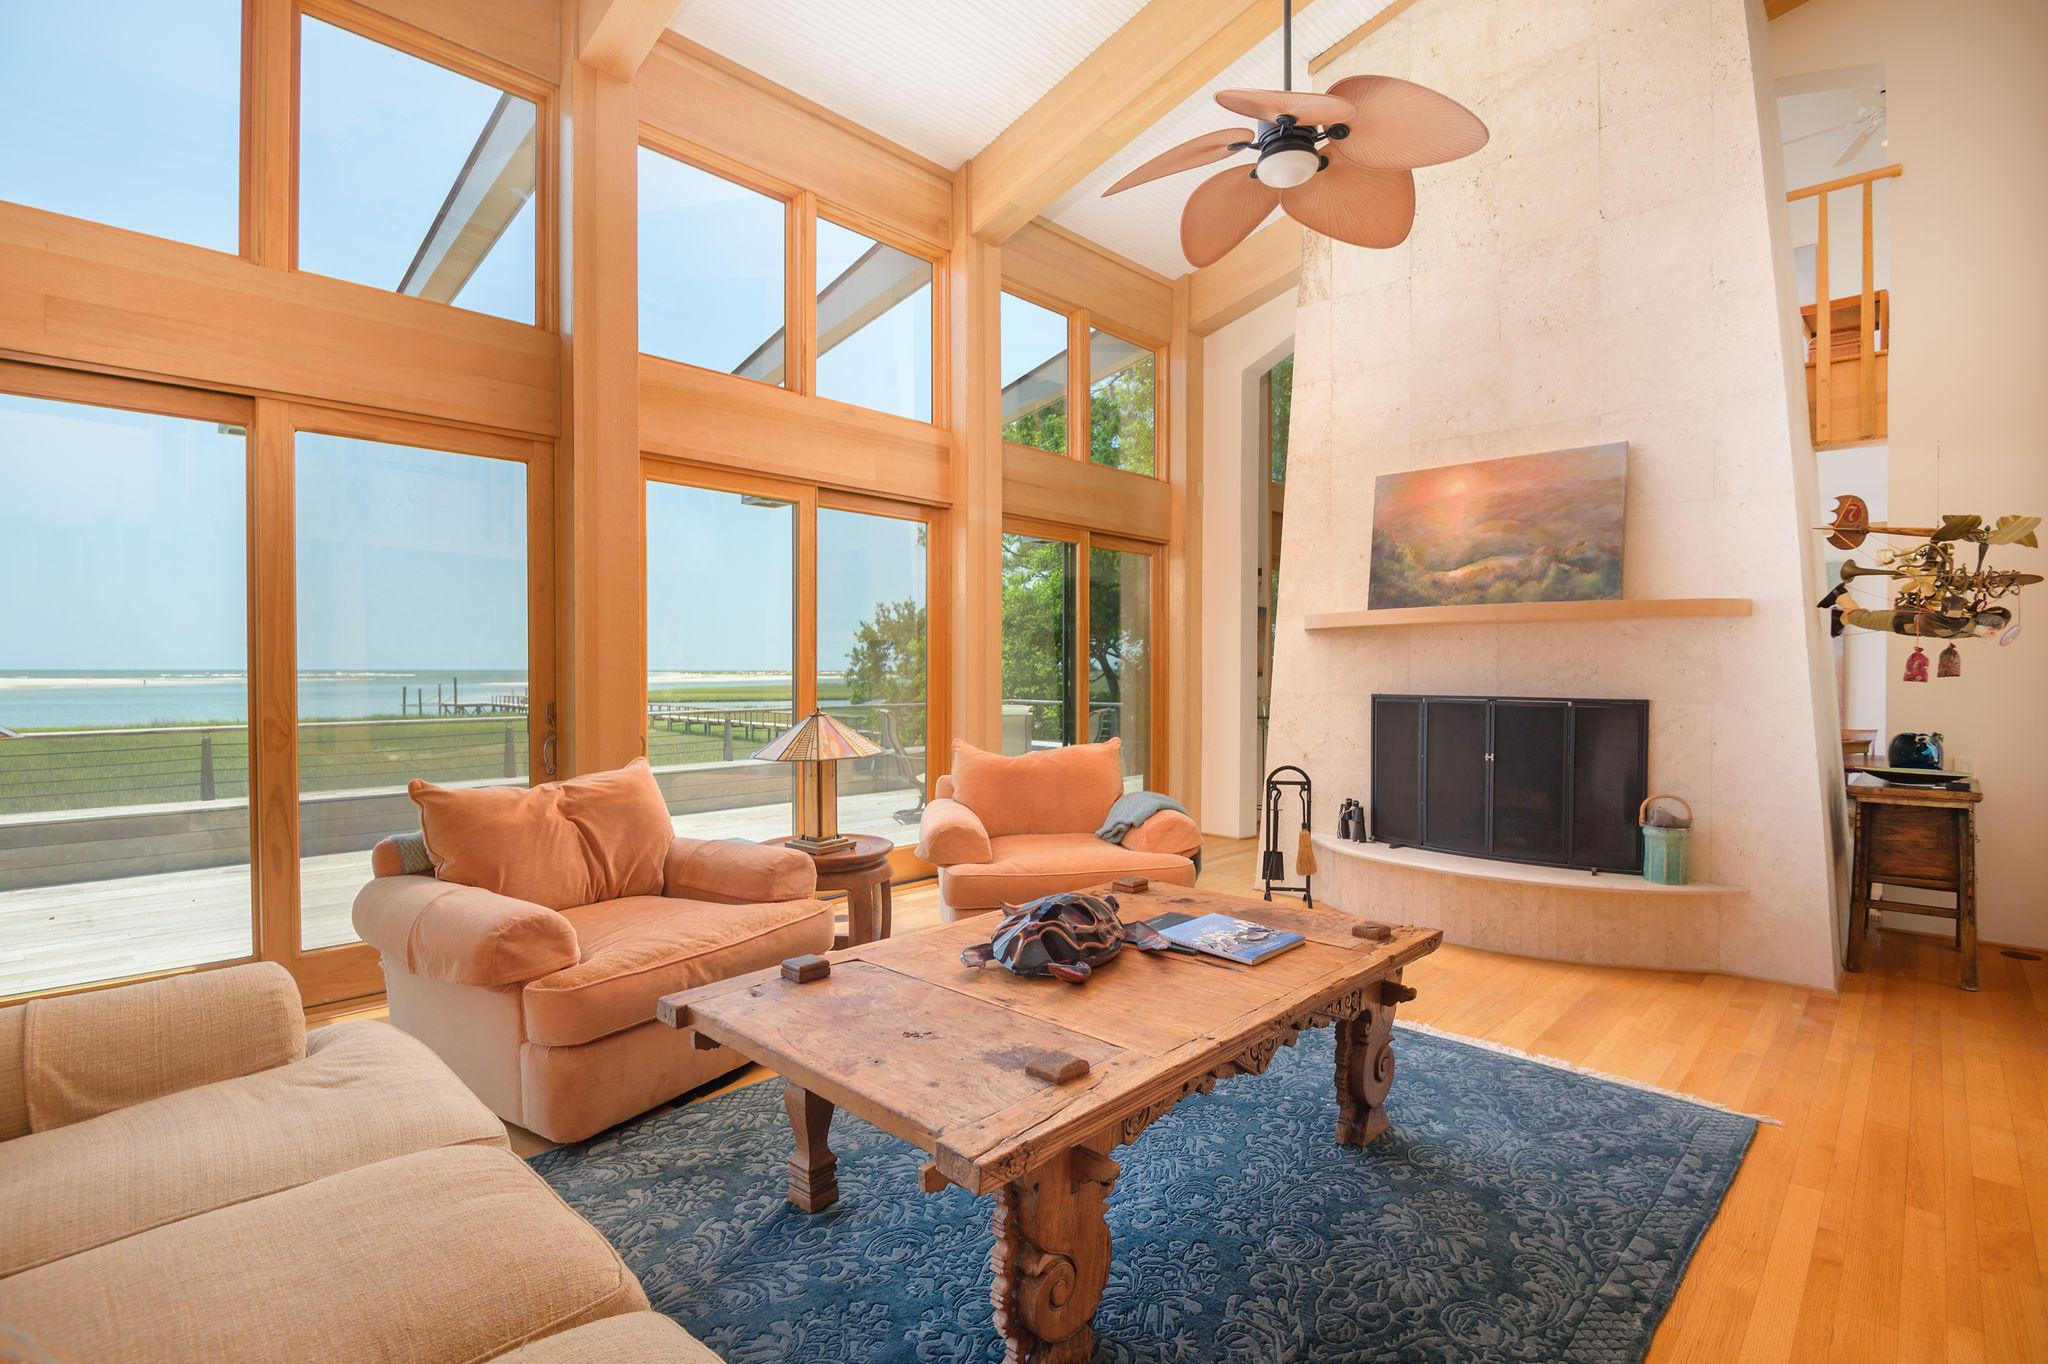 Seabrook Island Homes For Sale - 3087 Marshgate, Seabrook Island, SC - 37